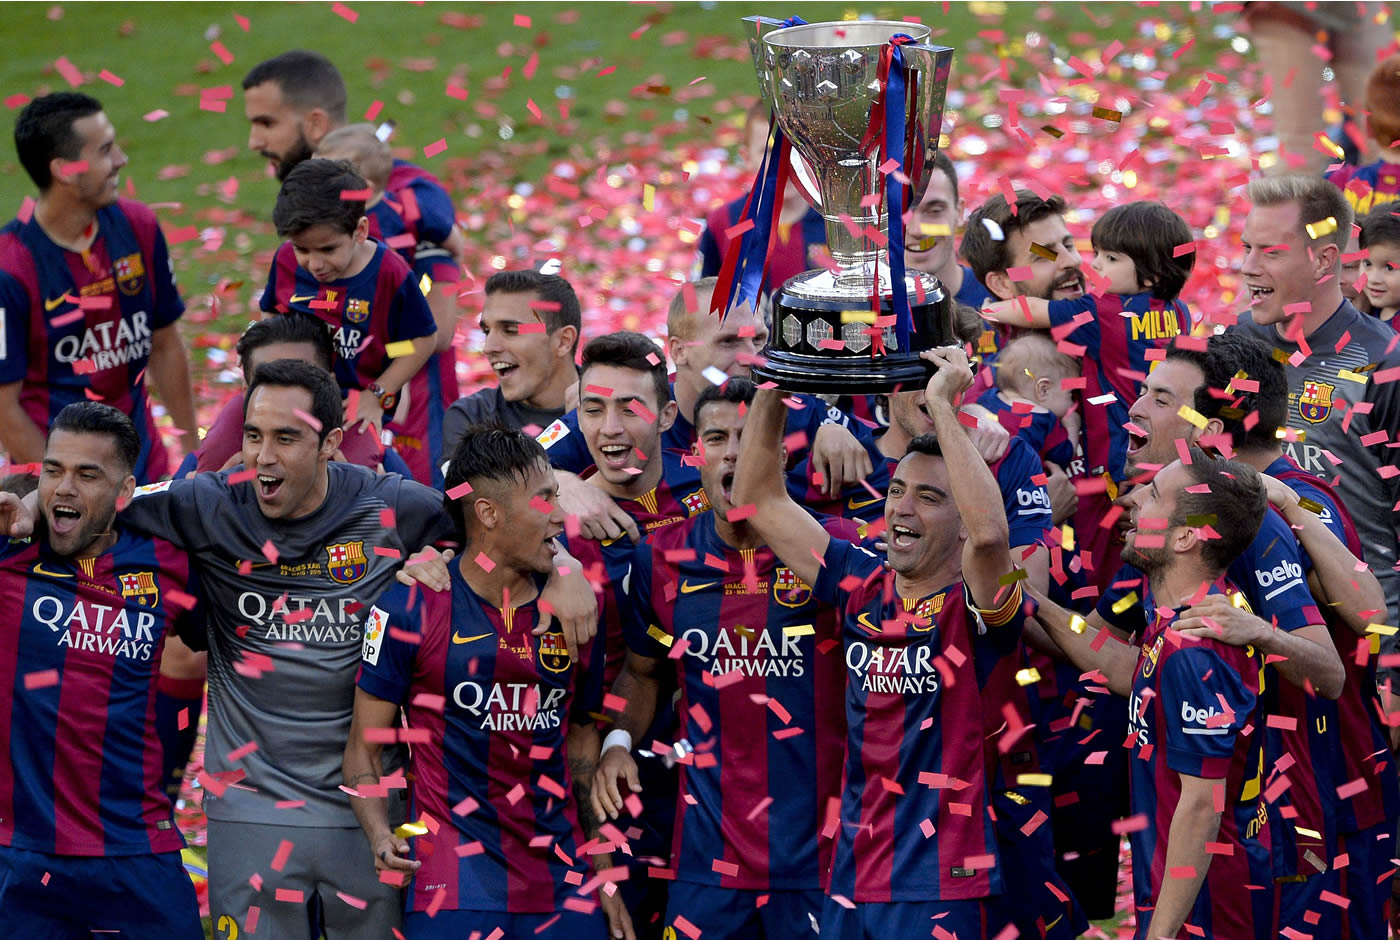 Barcelona 2-2 Deportivo La Coruna (España)